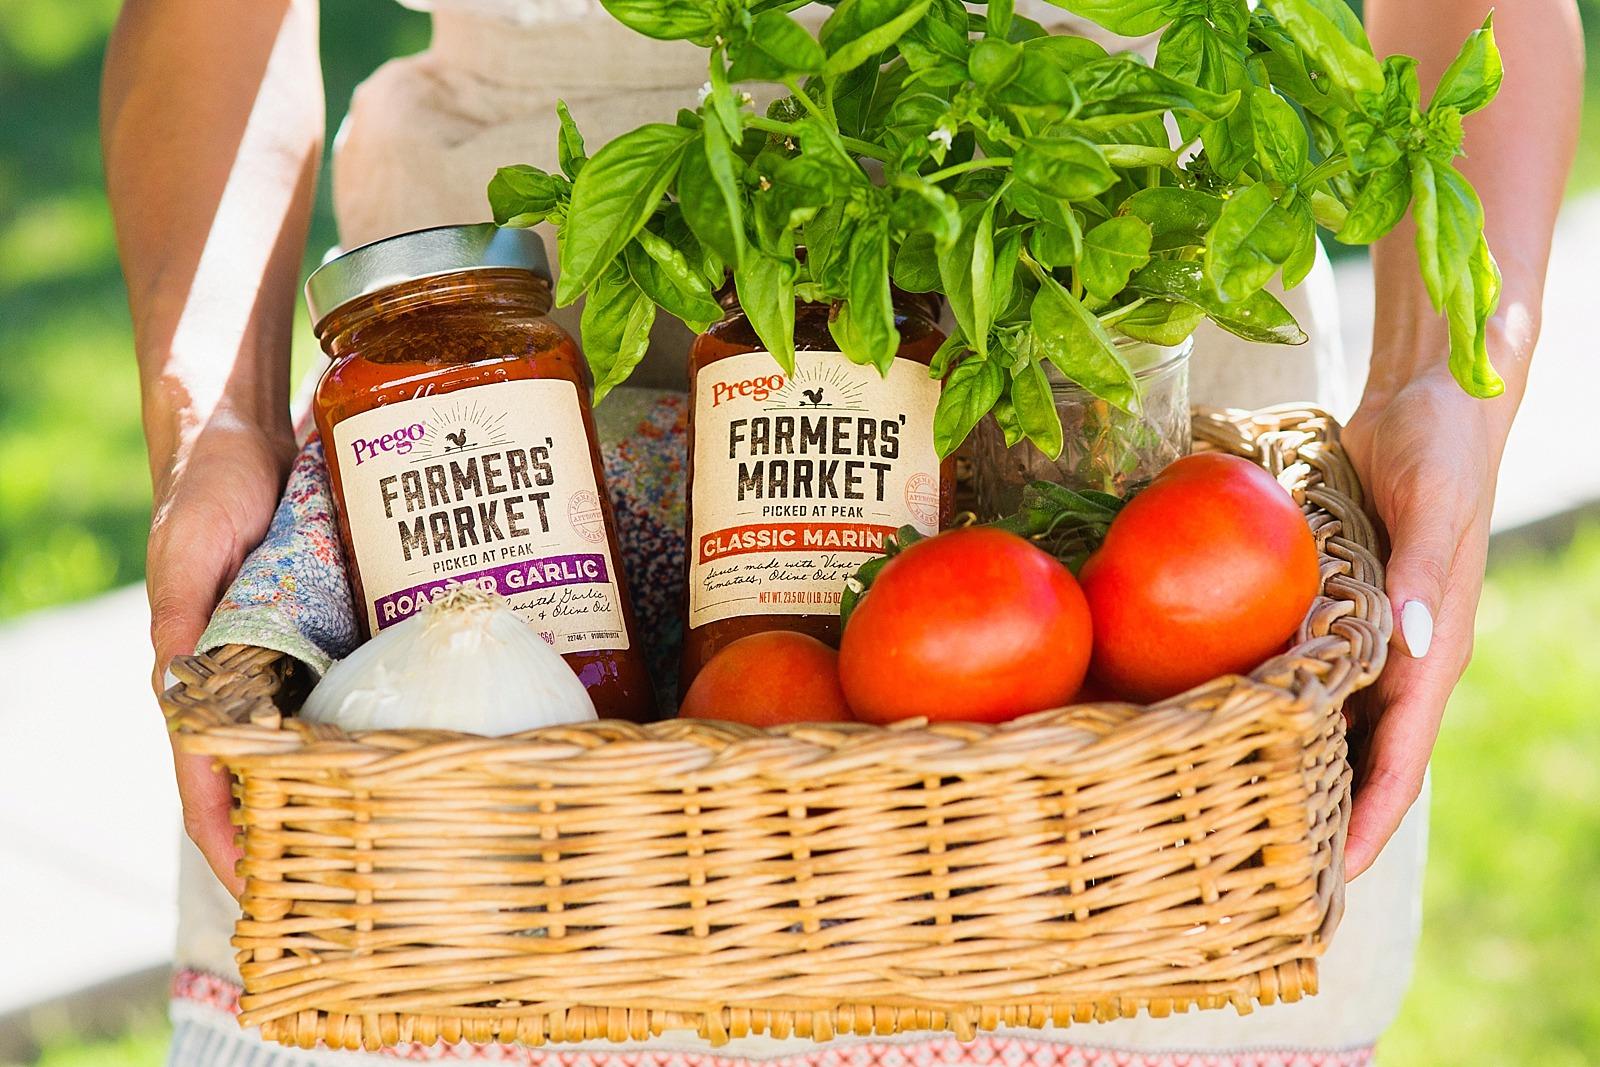 prego-farmers-market-recipe-penne-italian-sausage-basil-334